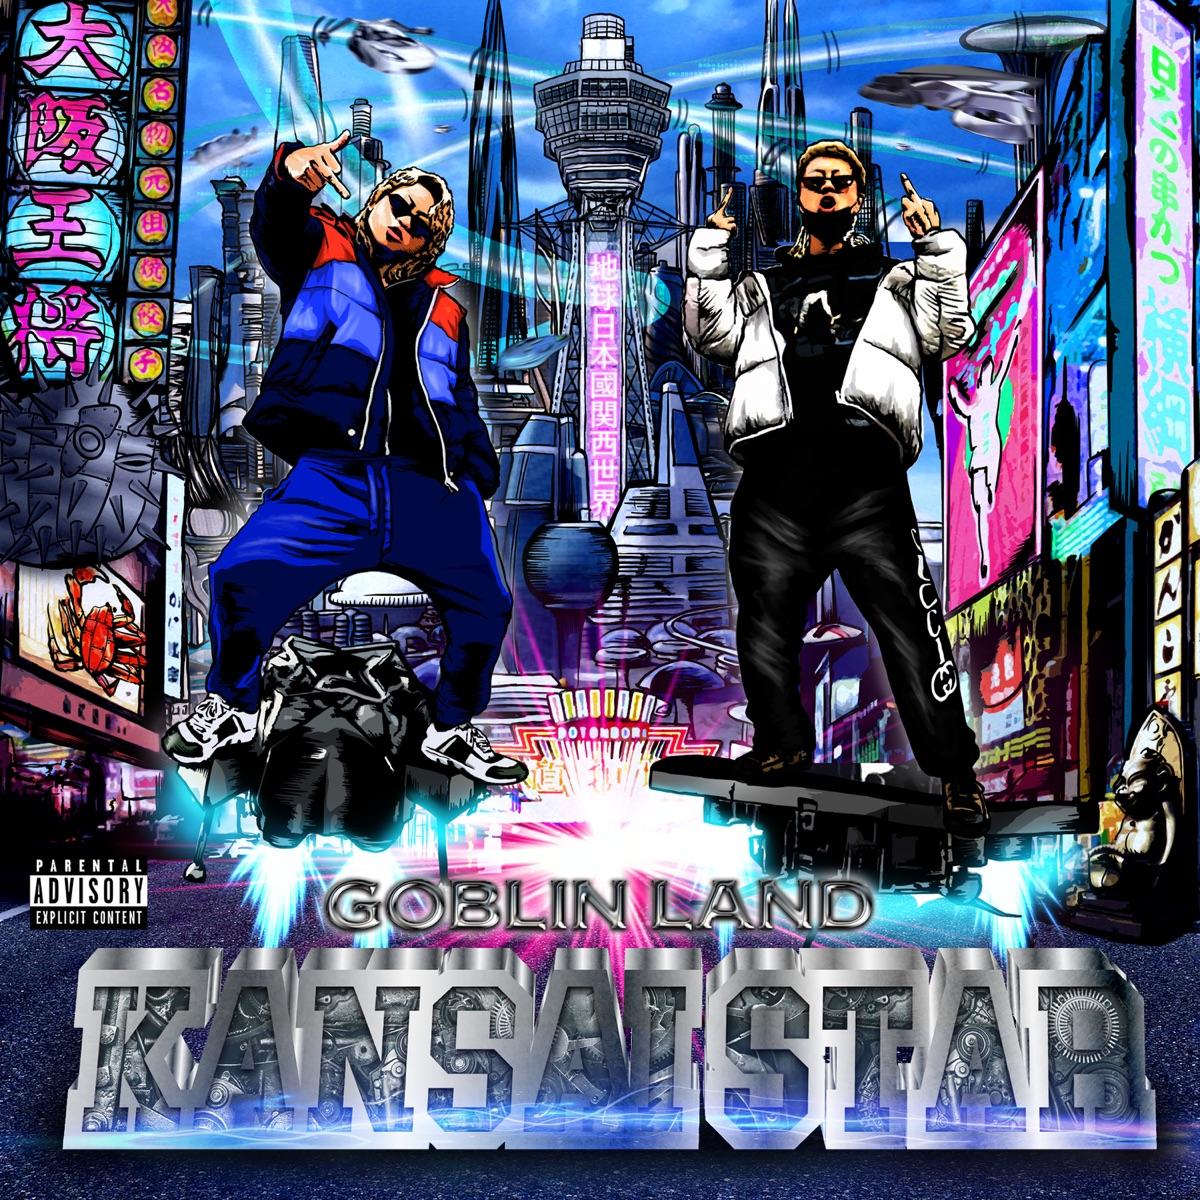 『GOBLIN LAND - KANSAI STAR』収録の『KANSAI STAR』ジャケット